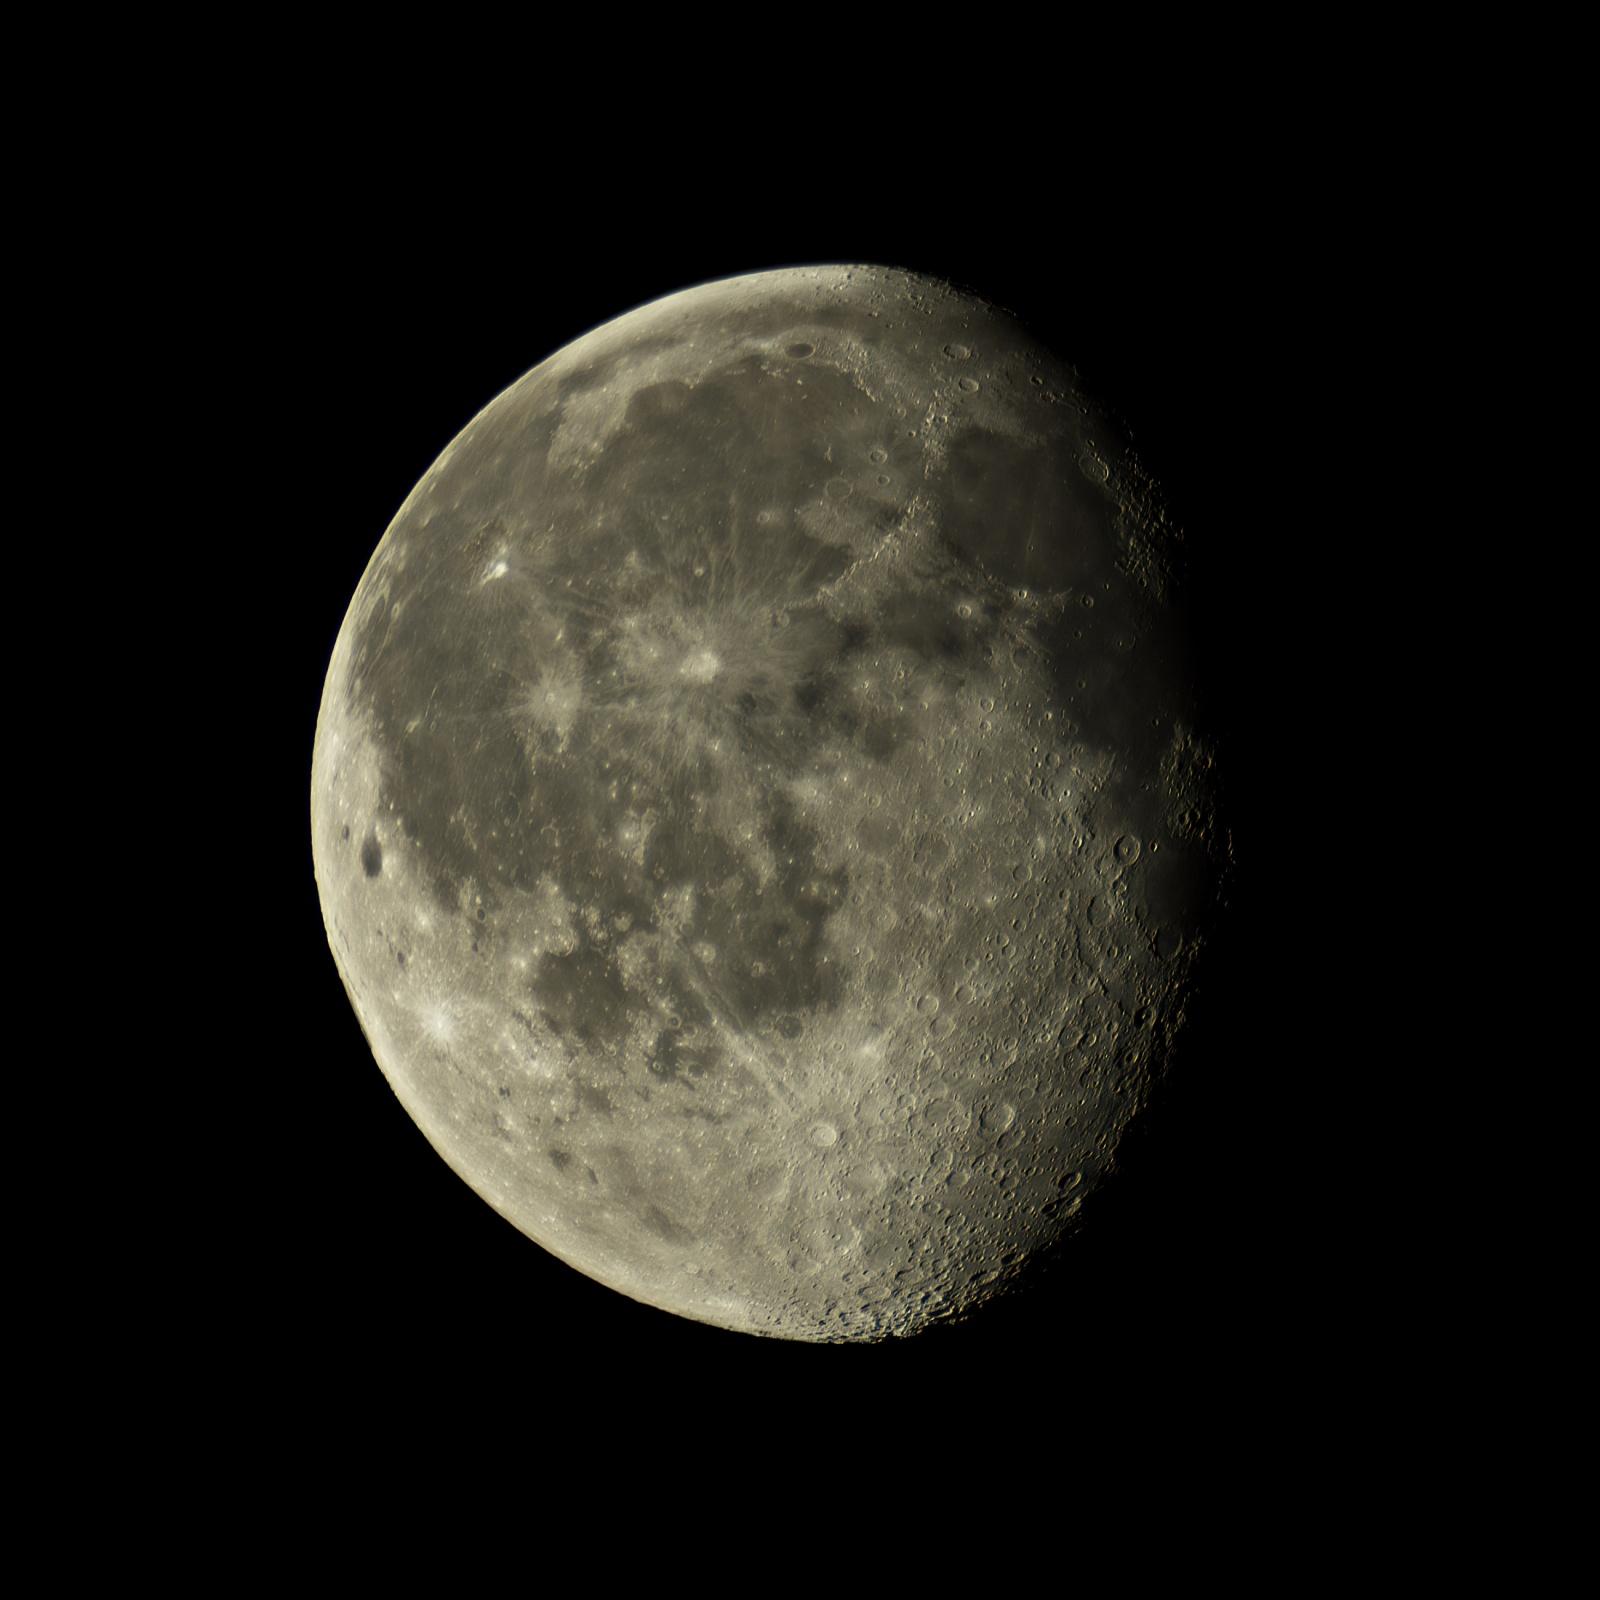 moon-2020-01-02--01.thumb.jpg.dd3de284f791ac89a0dfb90a1dc5b6bb.jpg